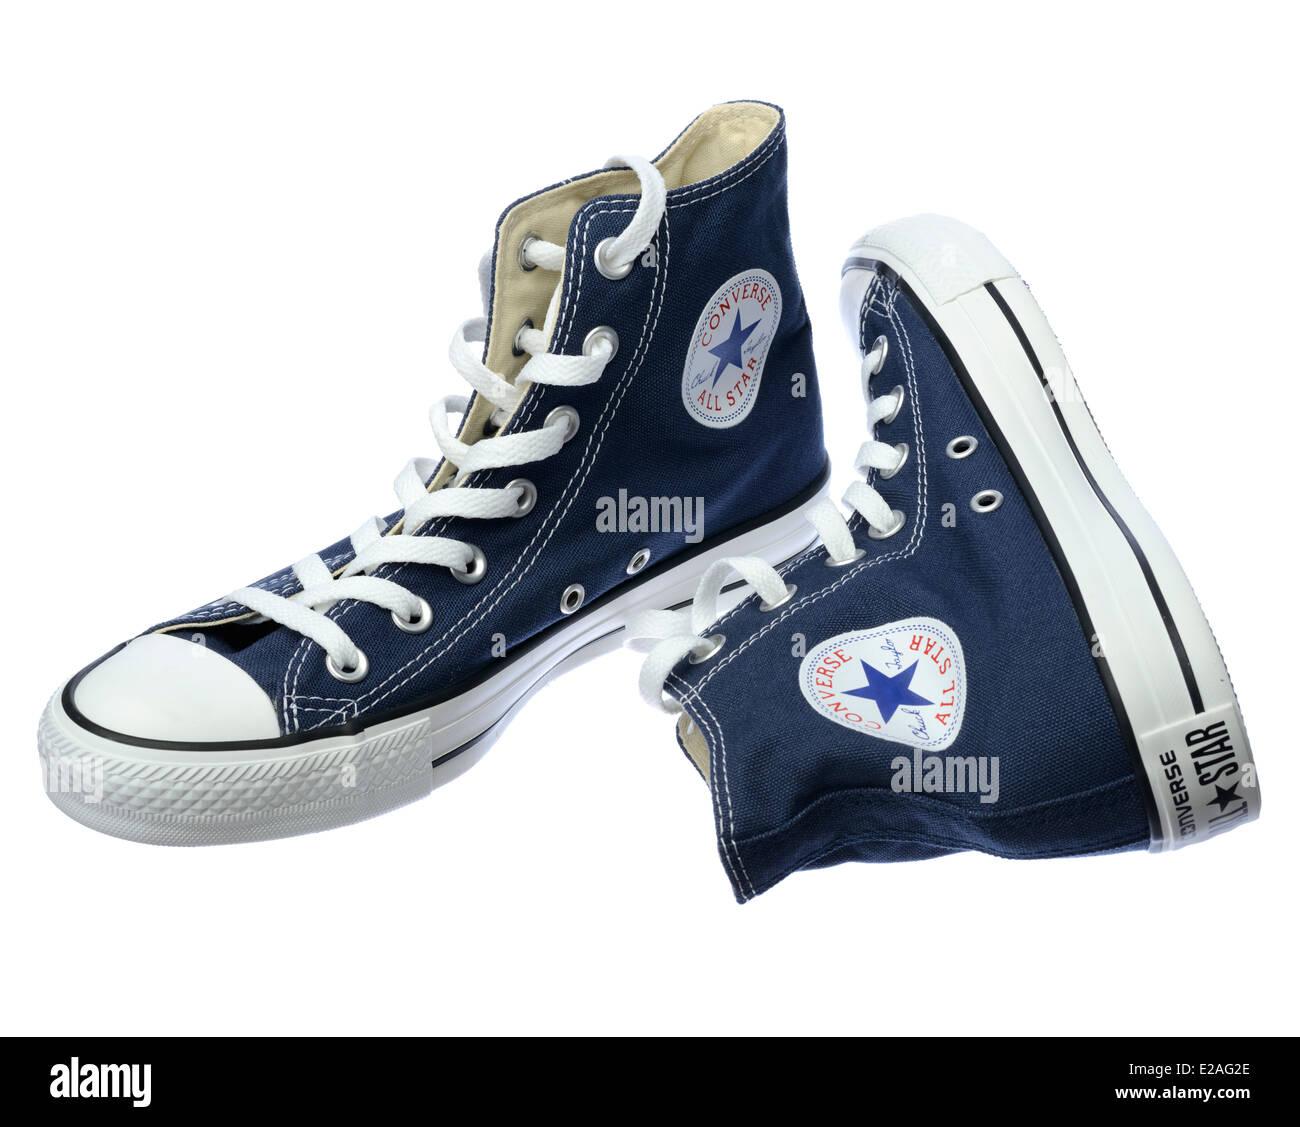 Converse Shoes Immagini e Fotos Stock - Alamy